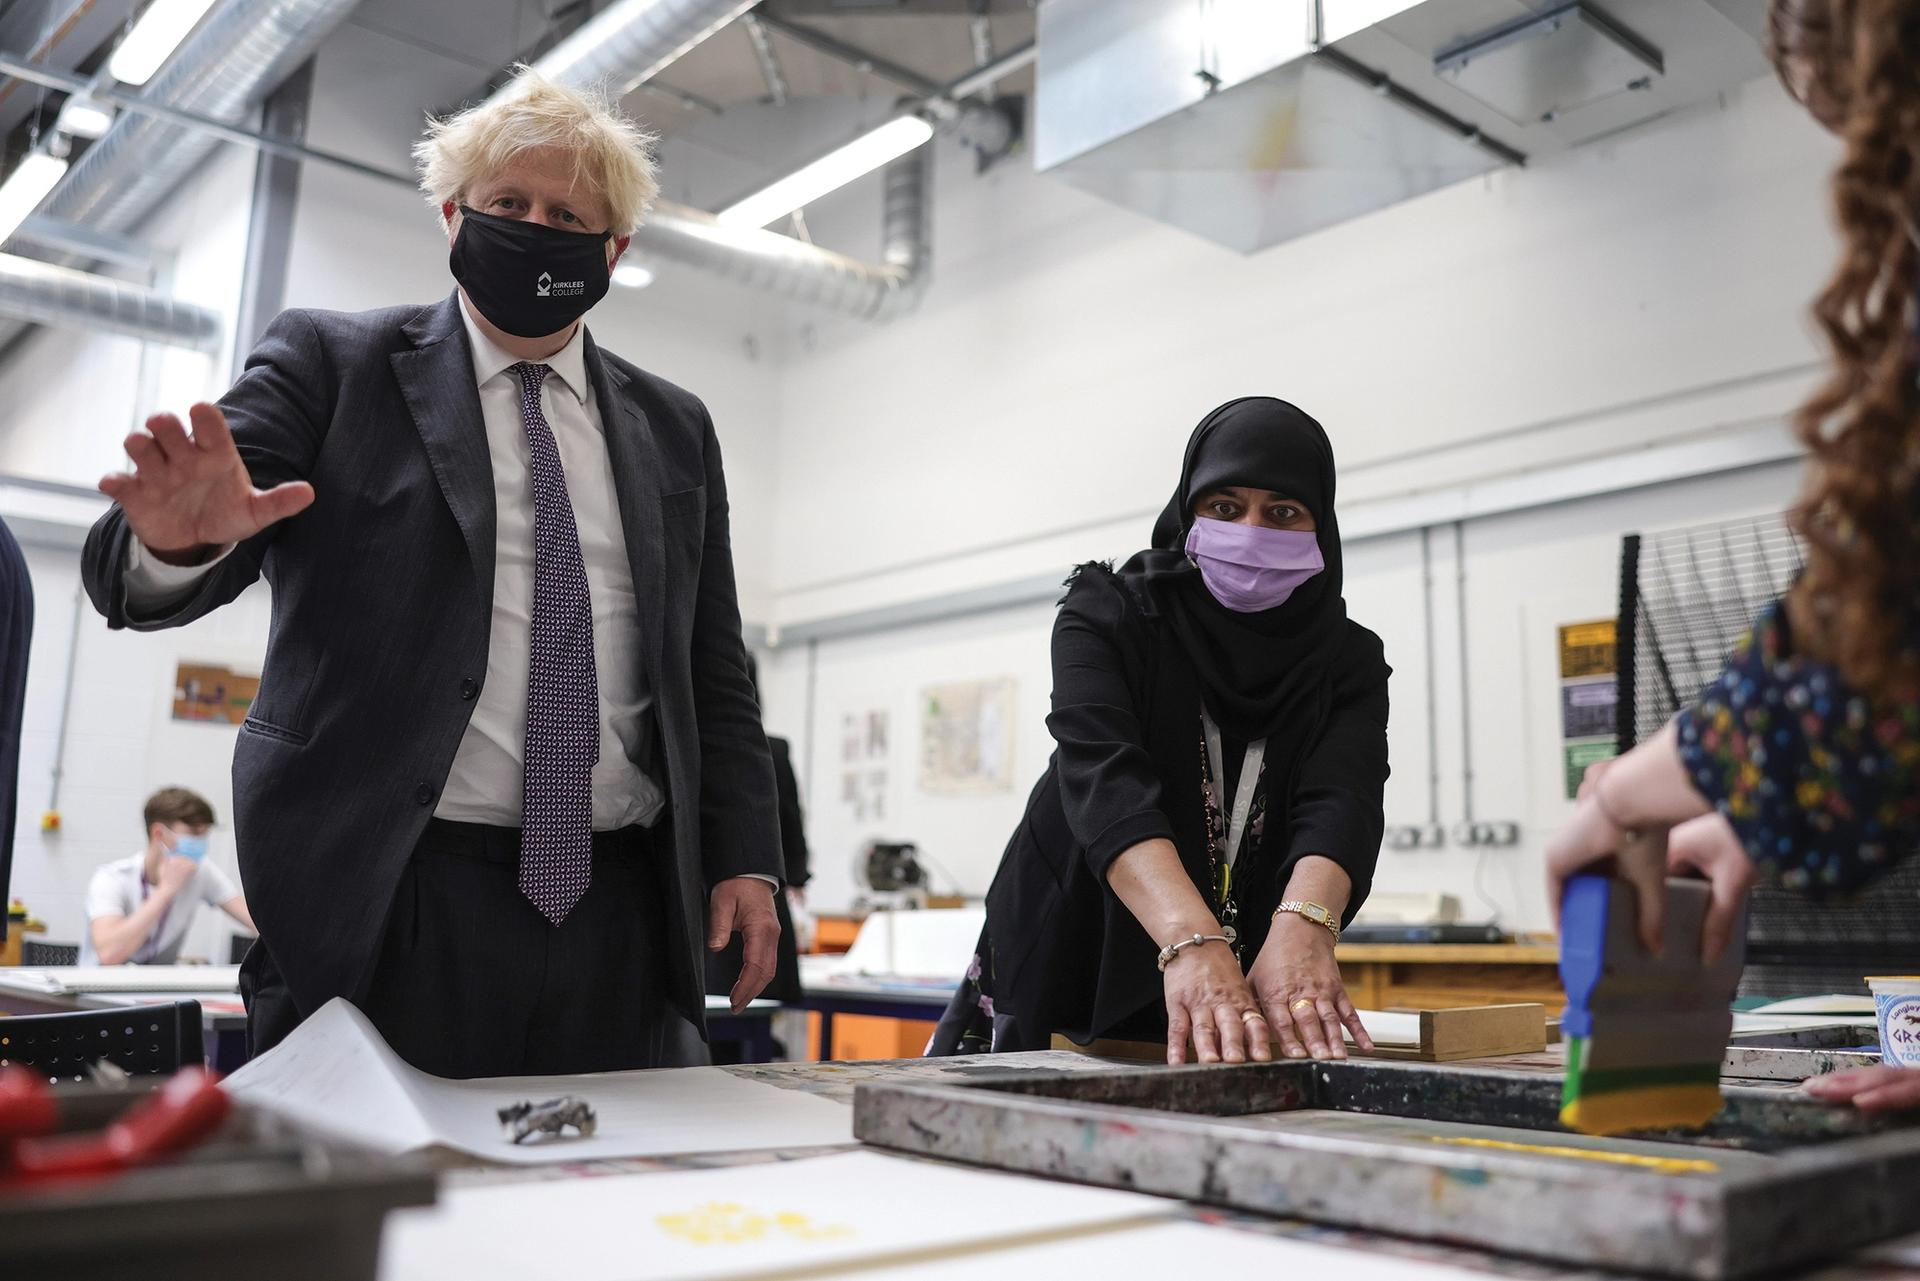 UK Prime Minister Boris Johnson visiting Kirklees College in Dewsbury Photo: Andrew Parsons / No 10 Downing Street